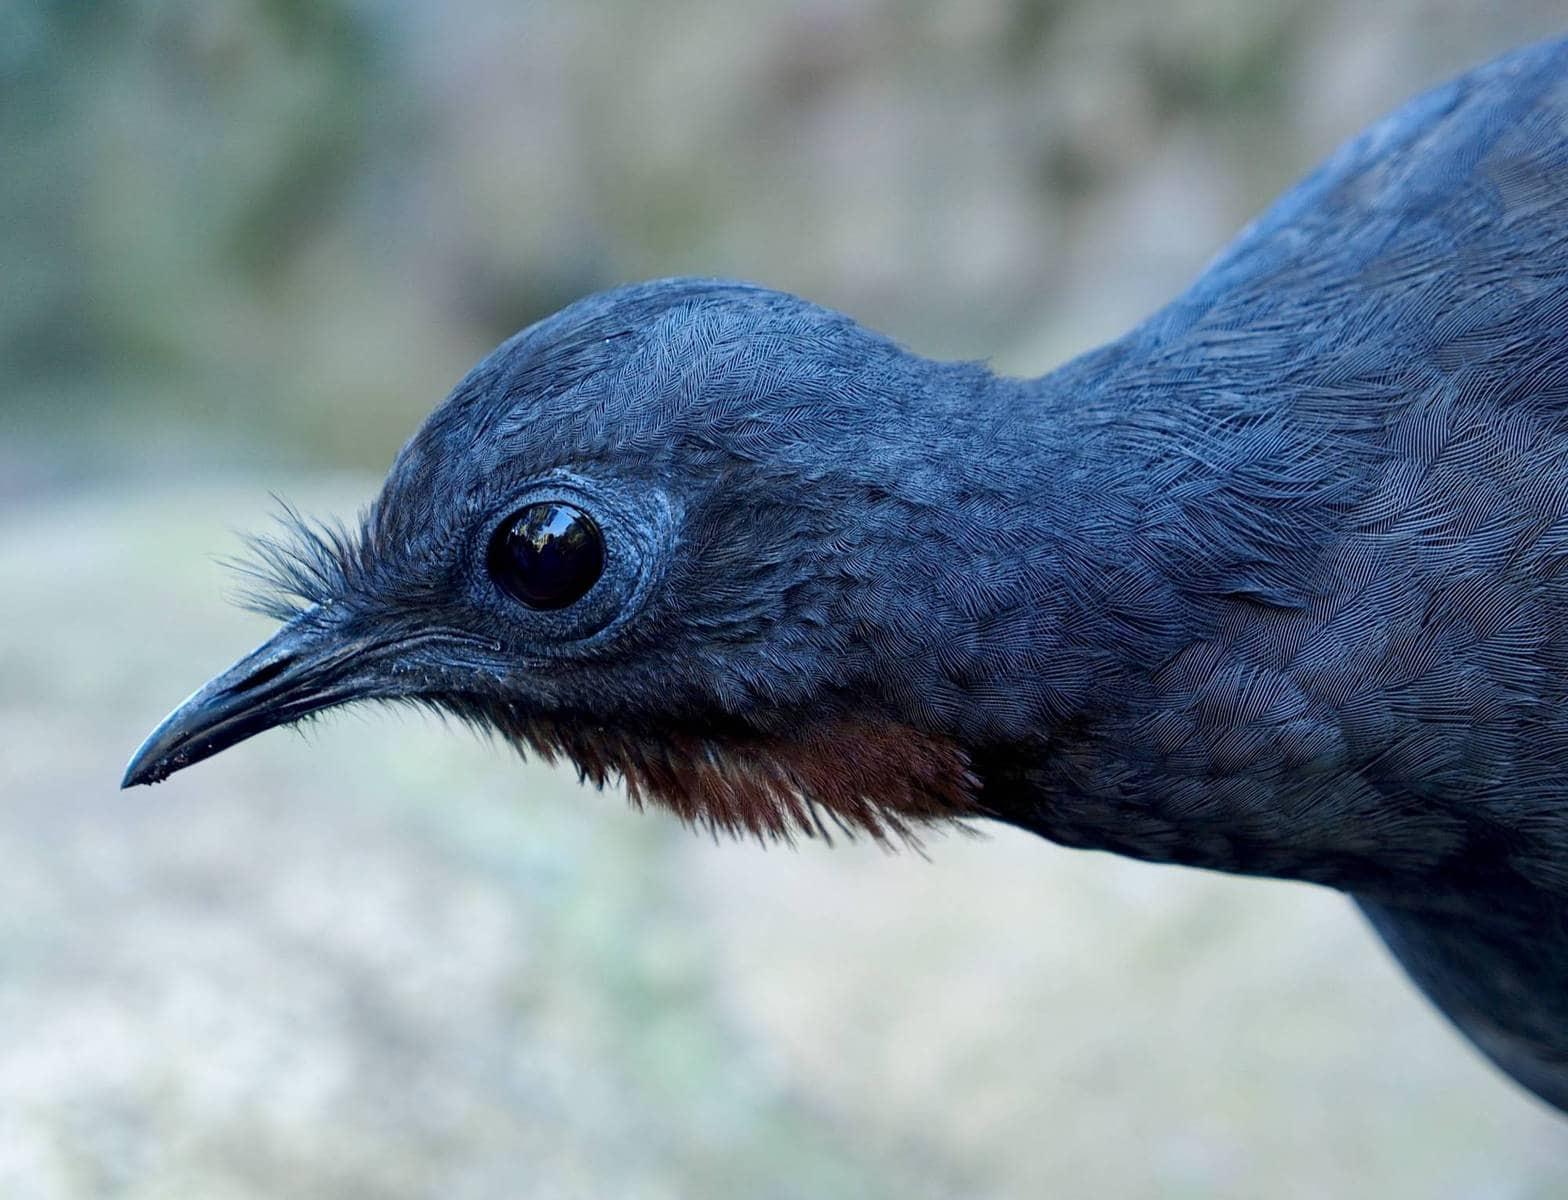 BBC - Travel - An Australian bird that mimics the sound of a chainsaw